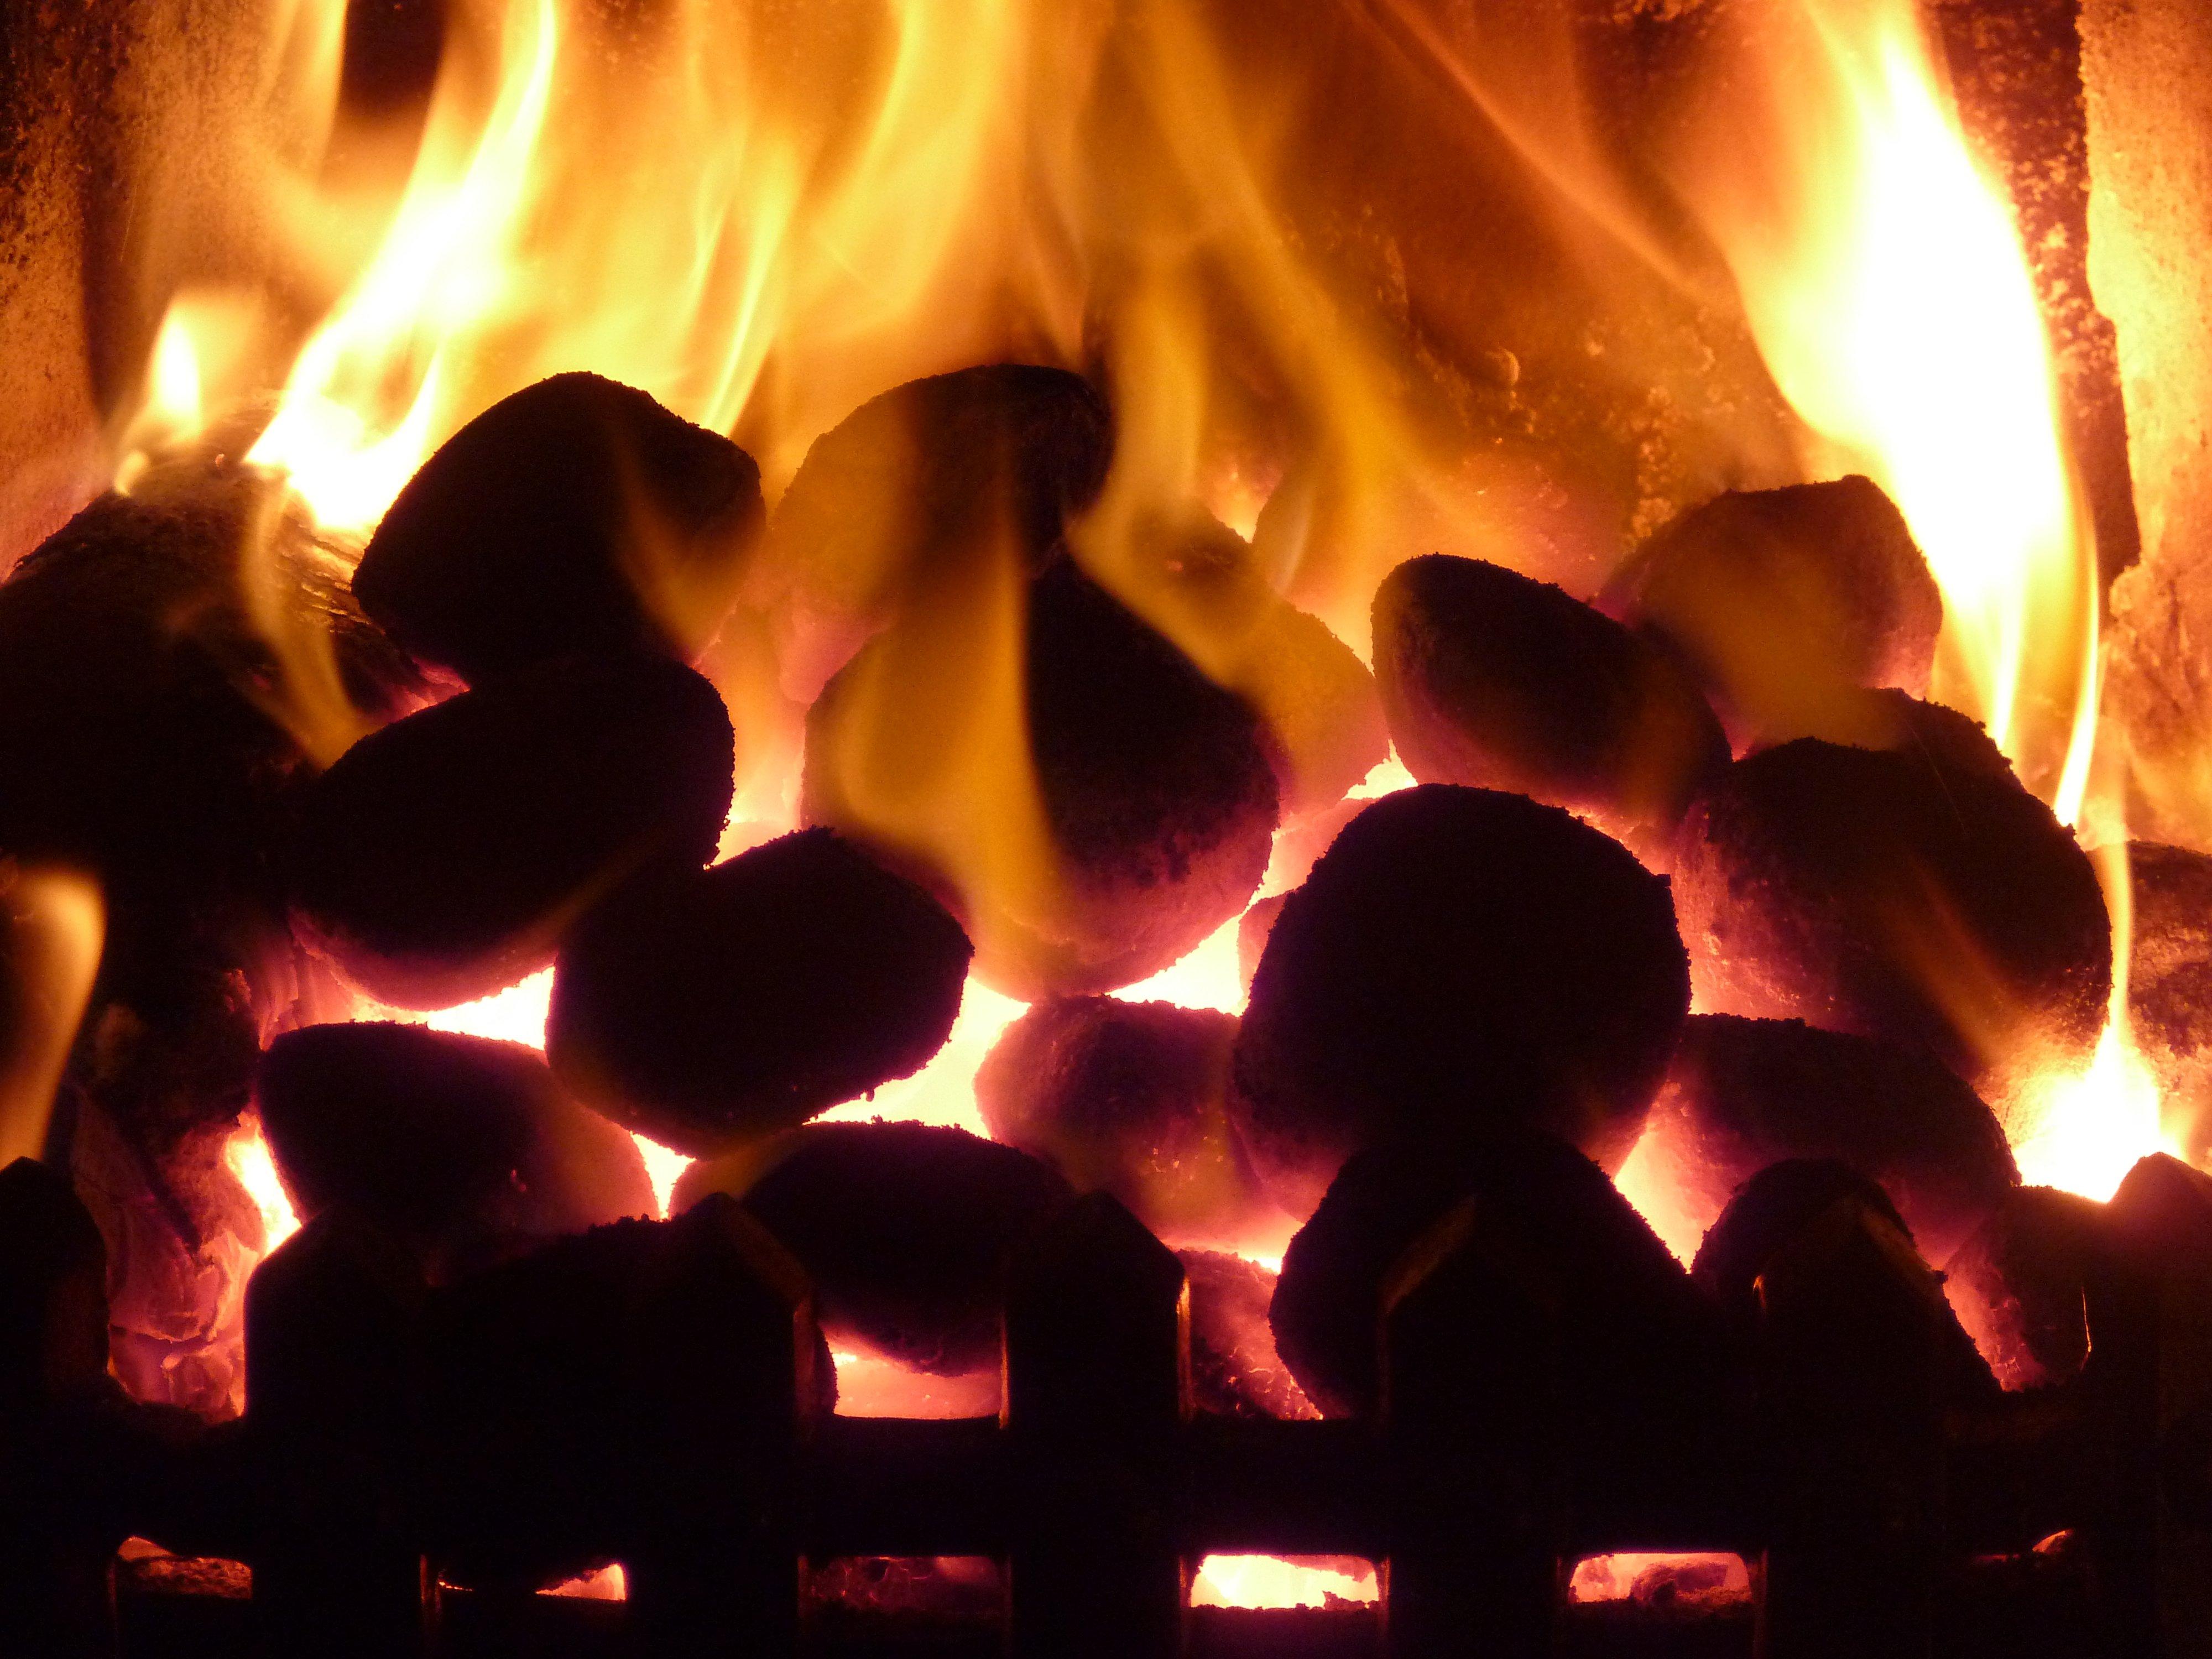 Smokeless fuels